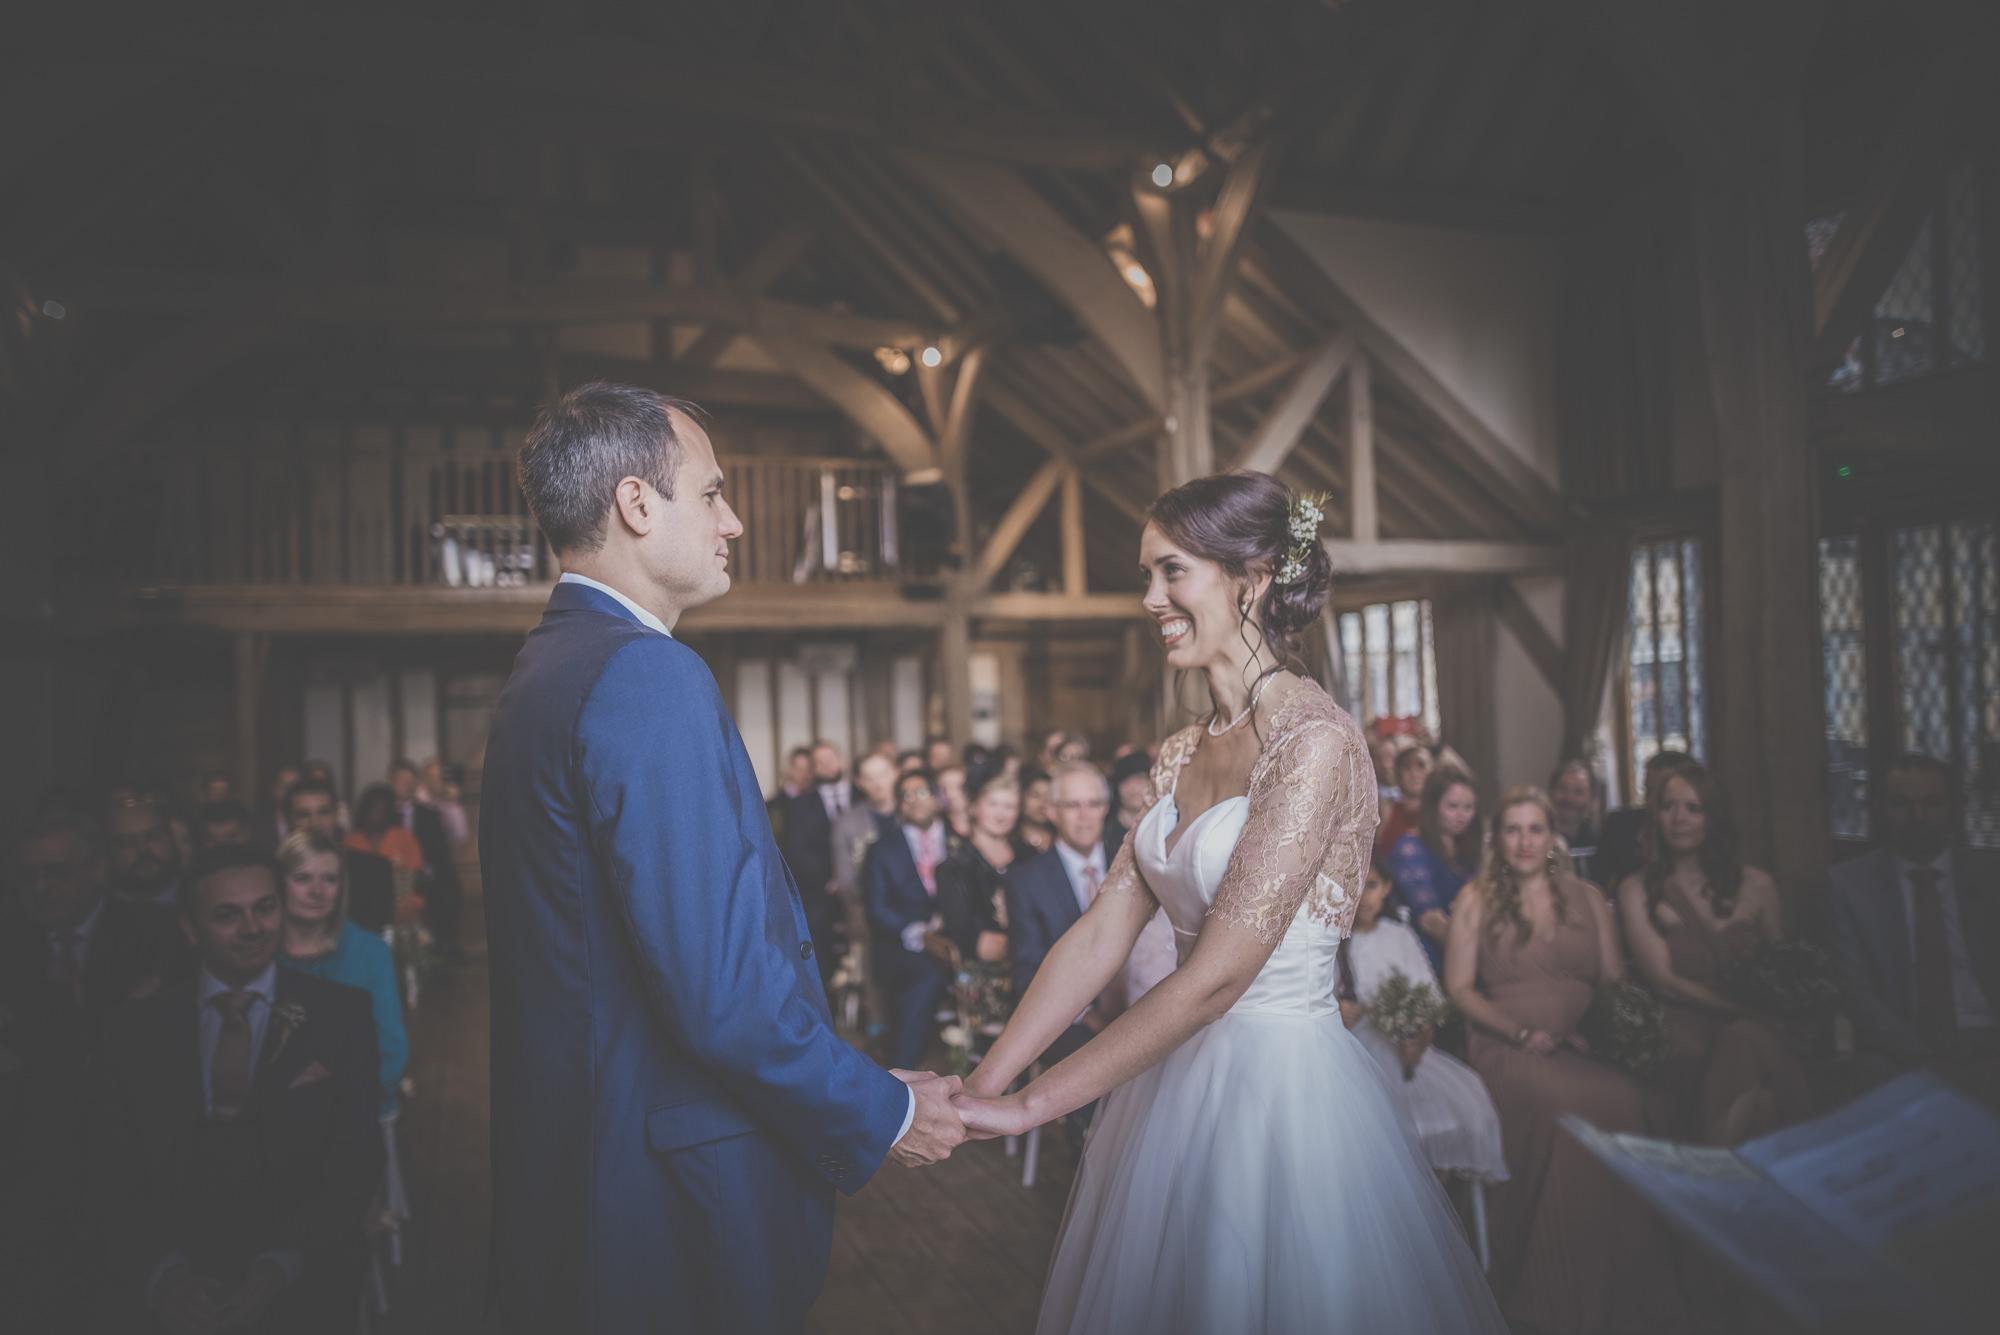 Charisse-and-James-wedding-in-Cain-Manor-Venue-Hampshire-Manu-Mendoza-Wedding-Photography-249.jpg